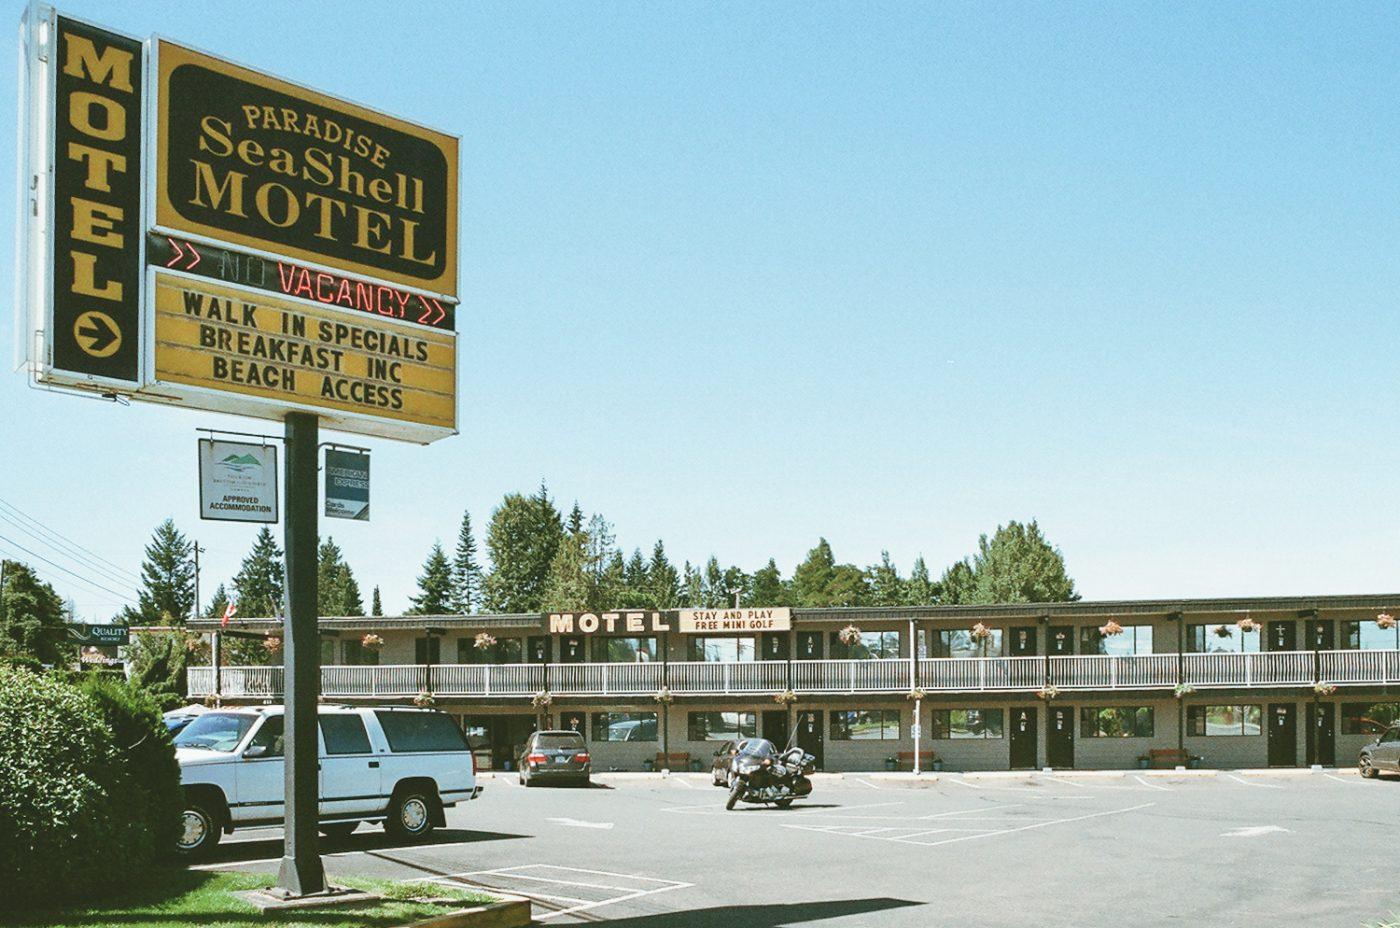 roadside motel in British Columbia, Canada